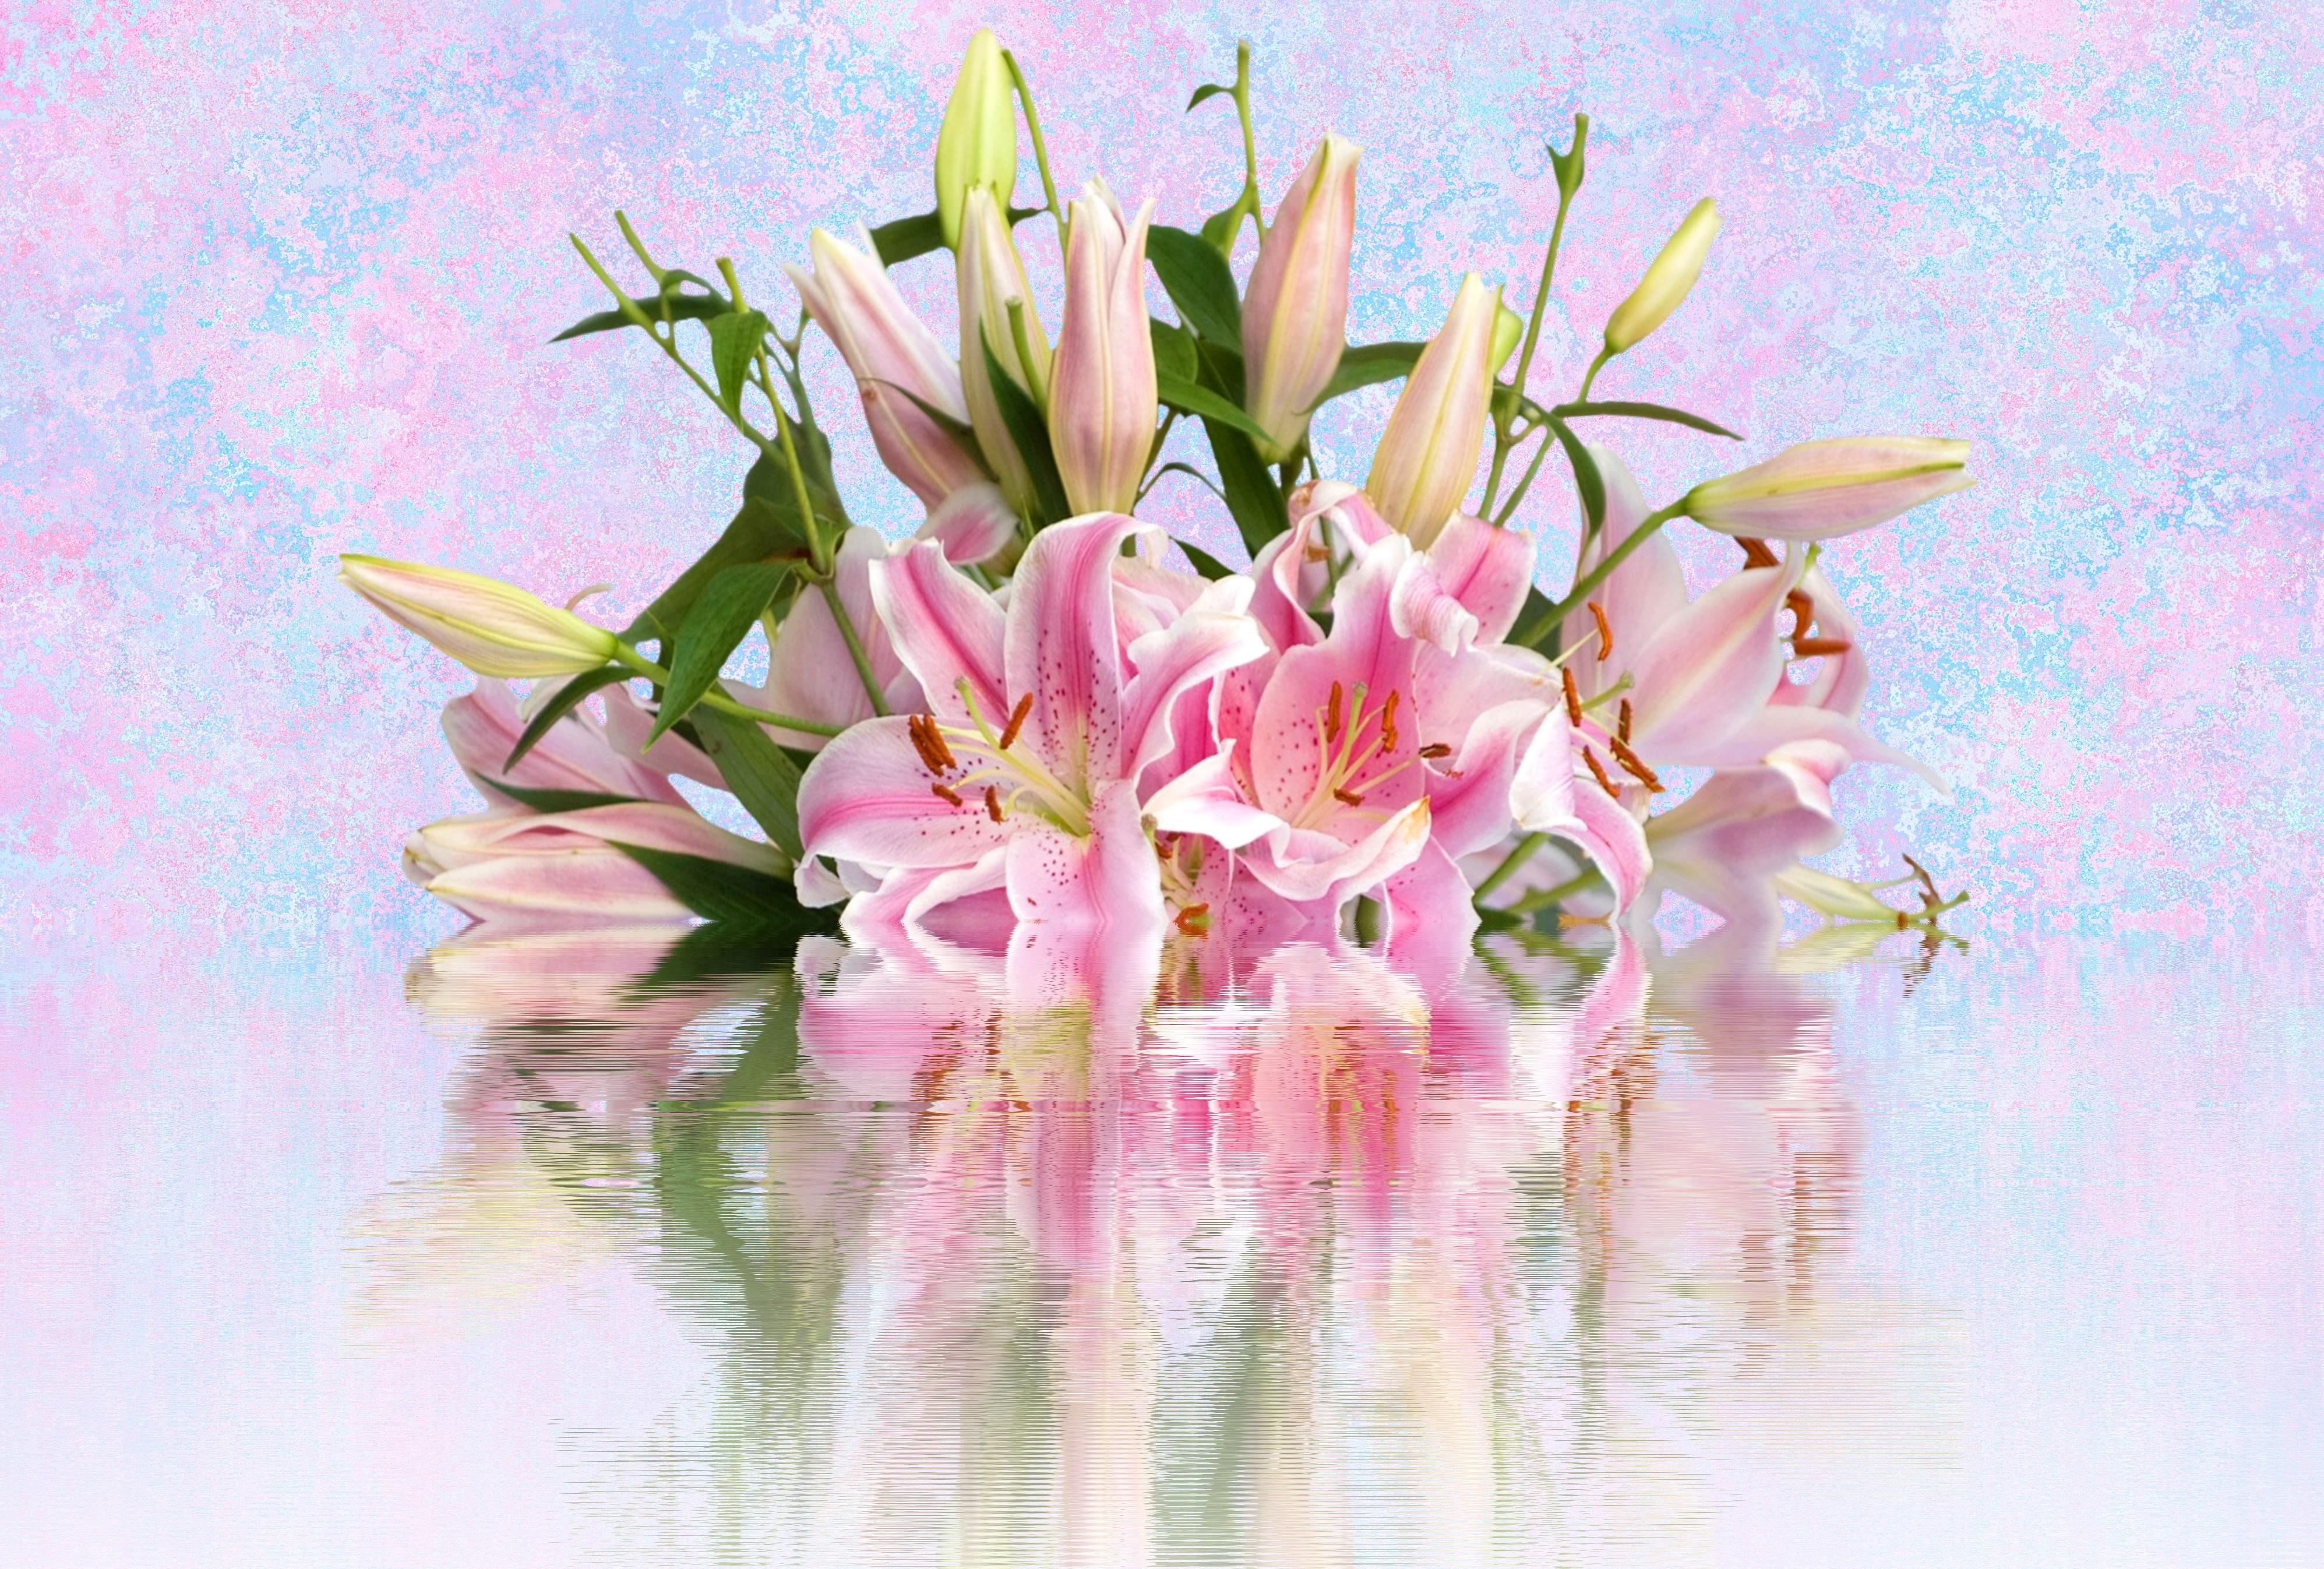 Welche Bedeutung Haben Lilien Im Feng Shui?